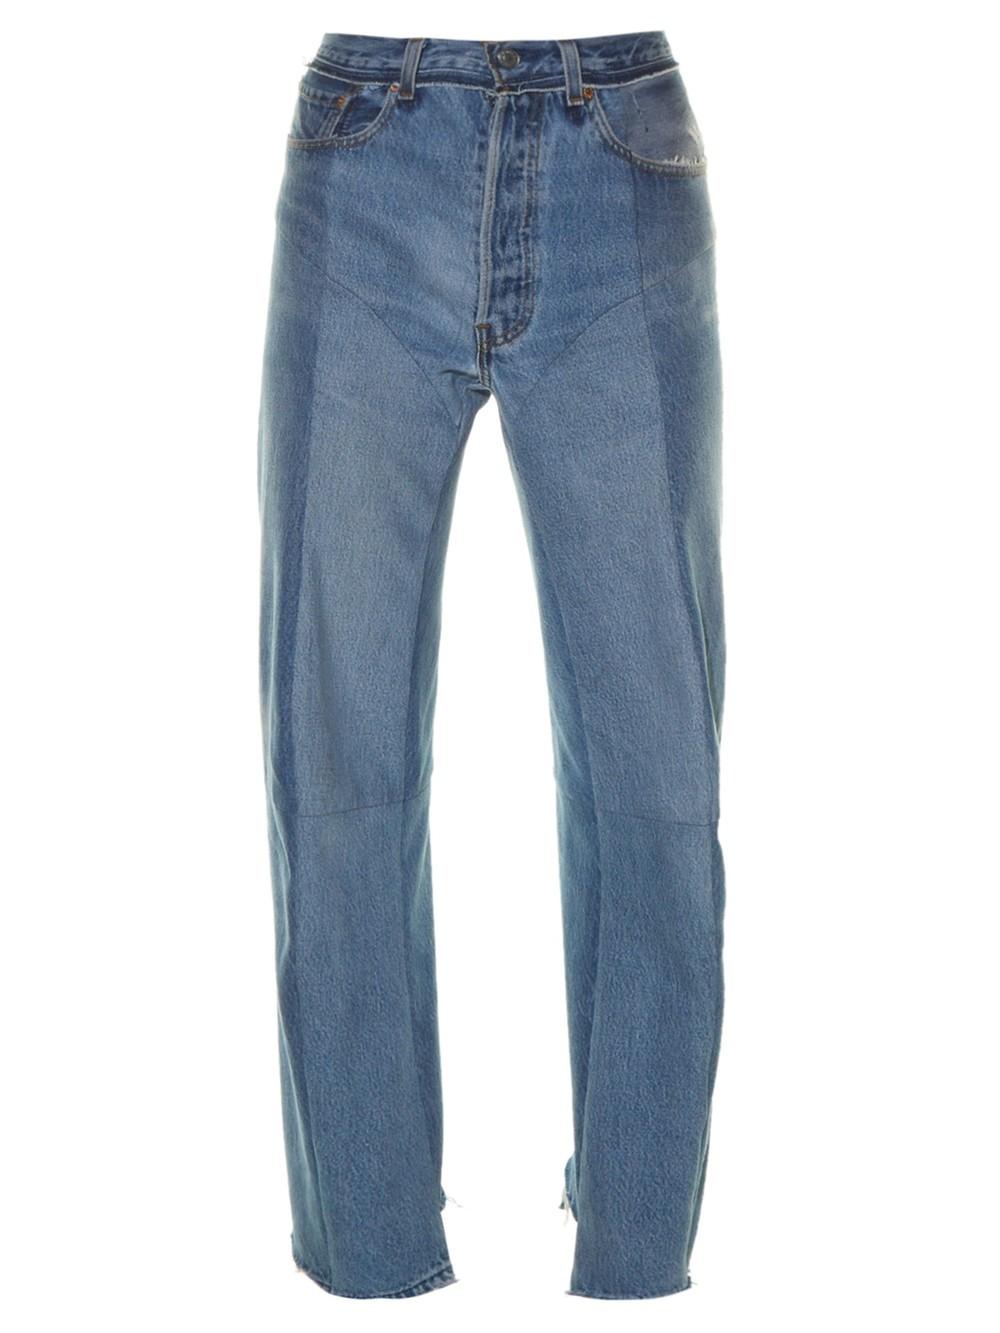 Vetements jeans.jpg